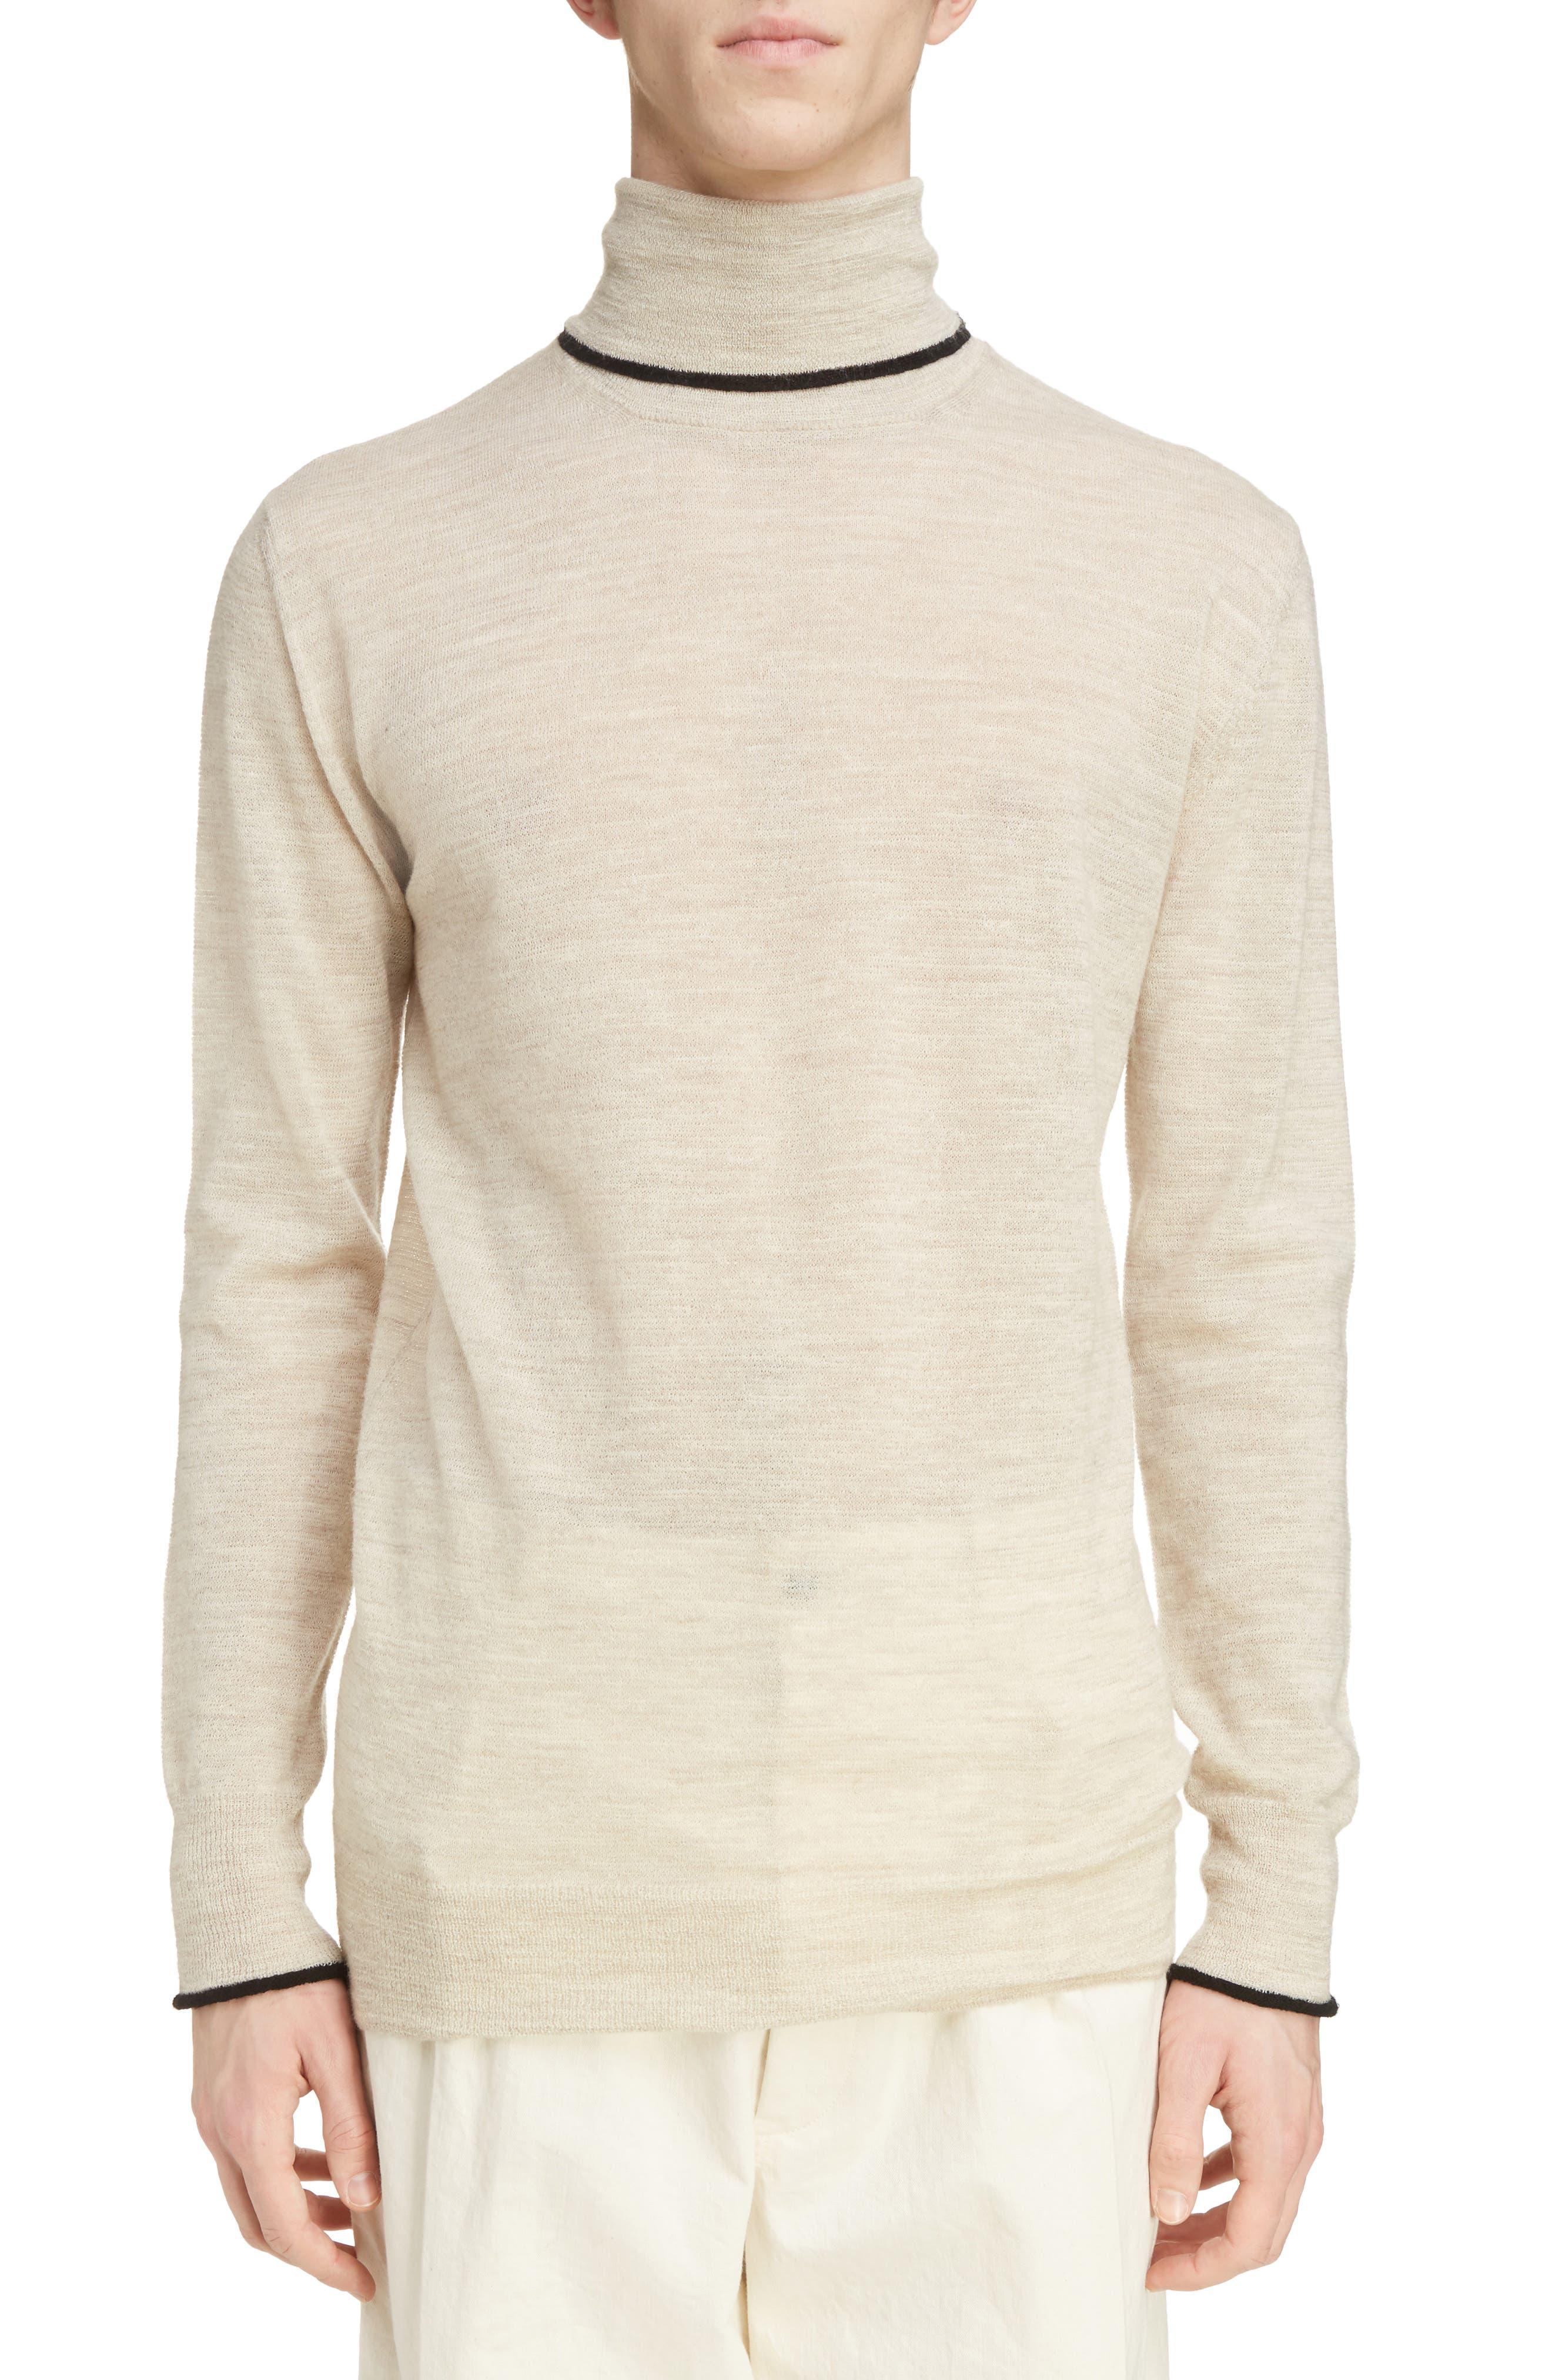 Main Image - Lanvin Contrast Tipped Wool Turtleneck